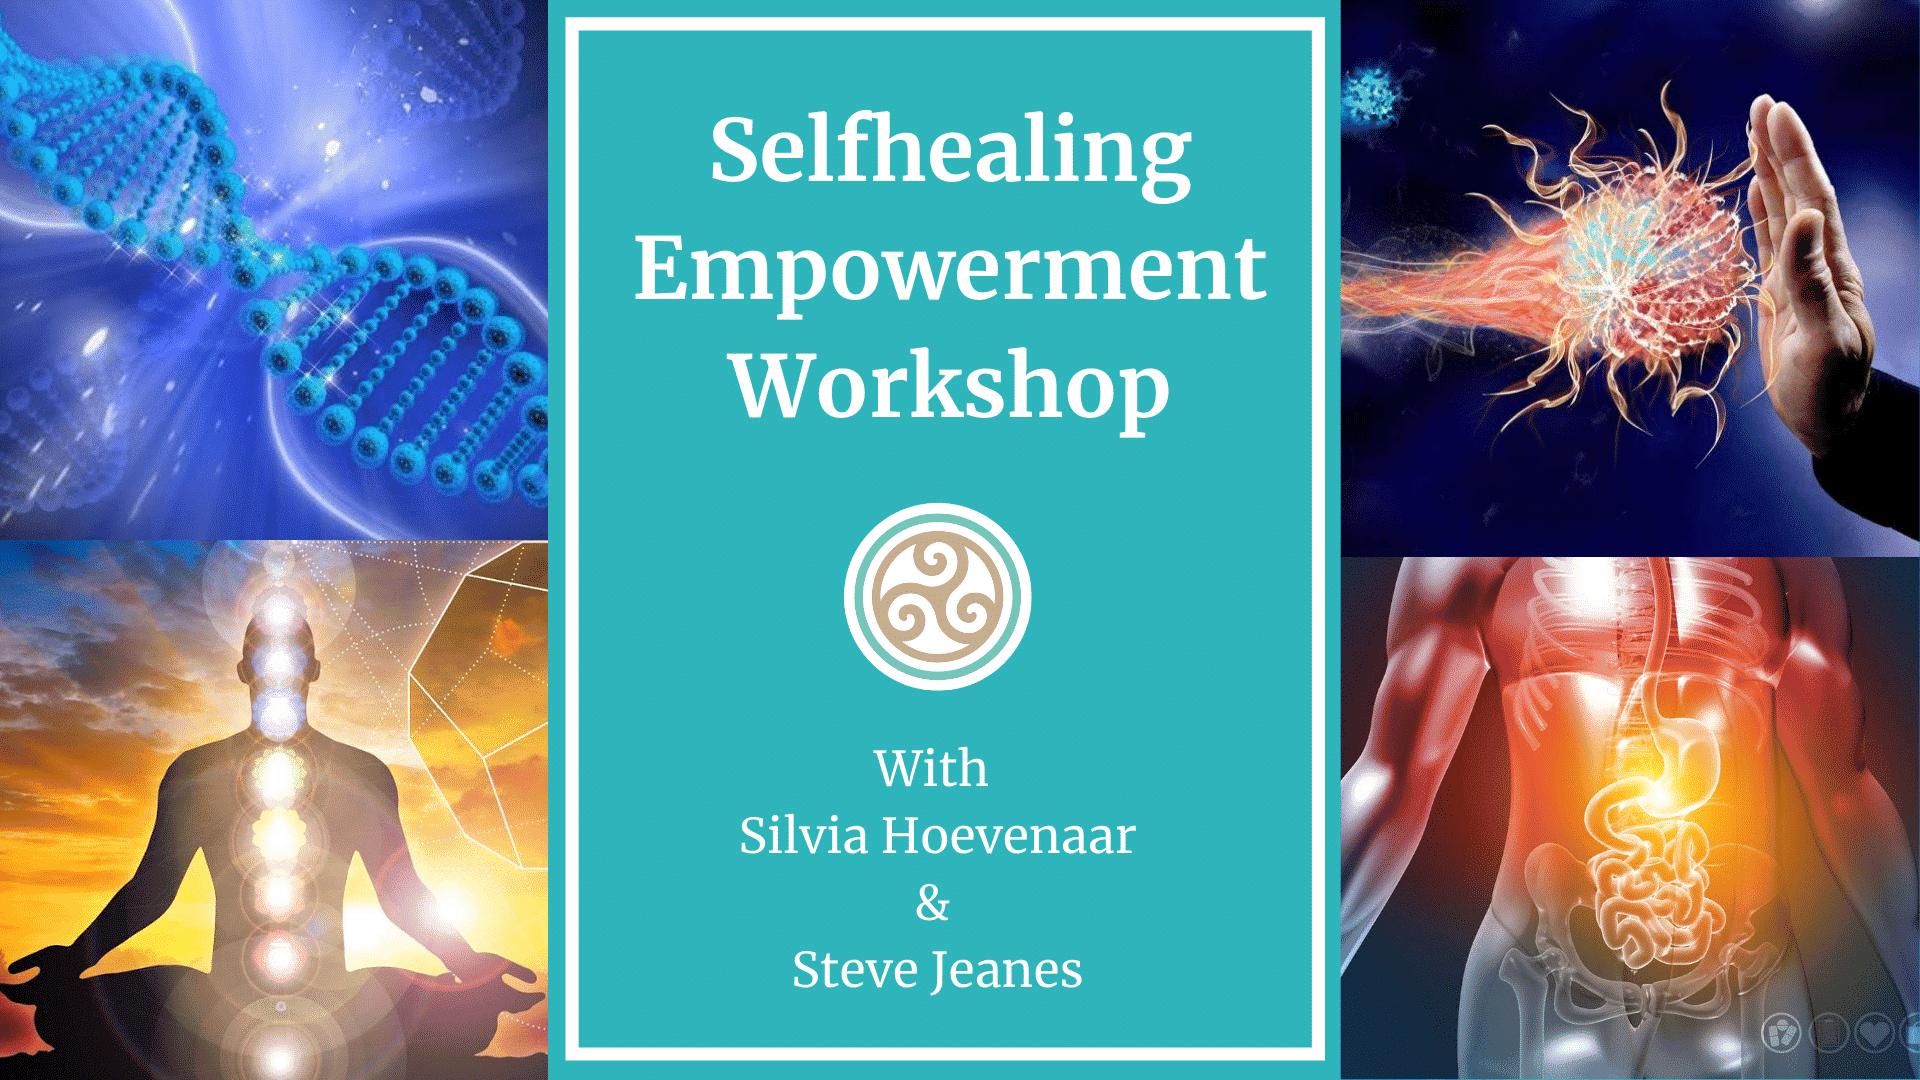 selfhealing empowerment